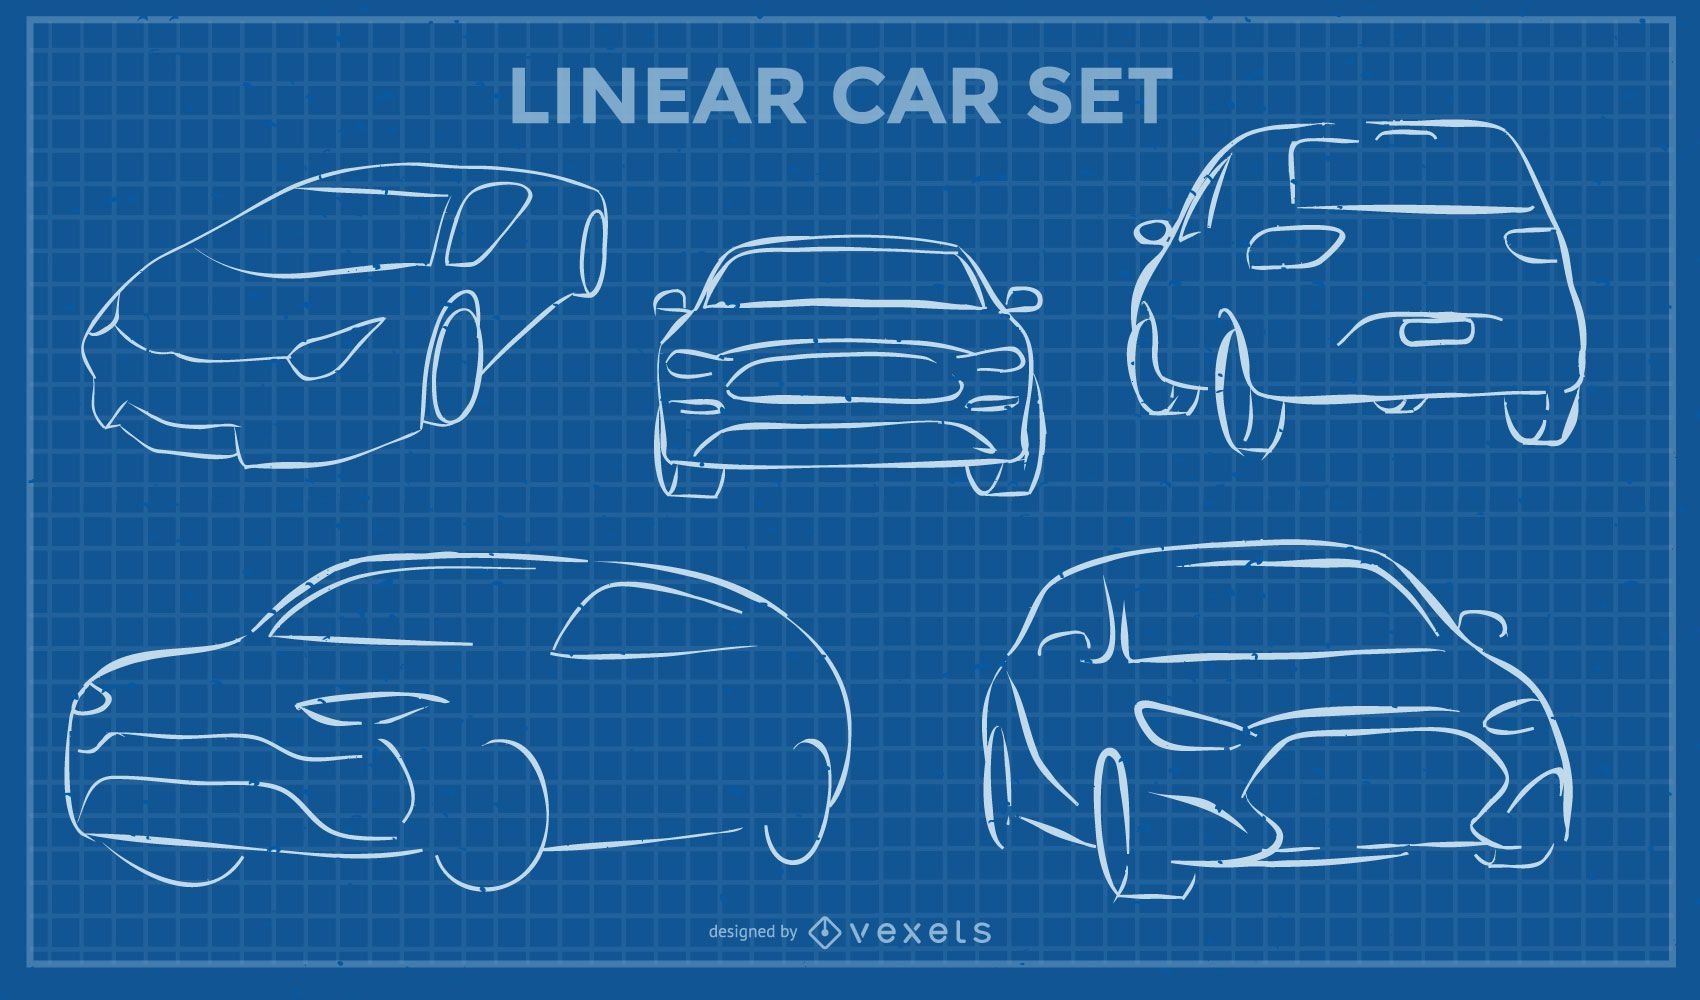 Linear Car Set